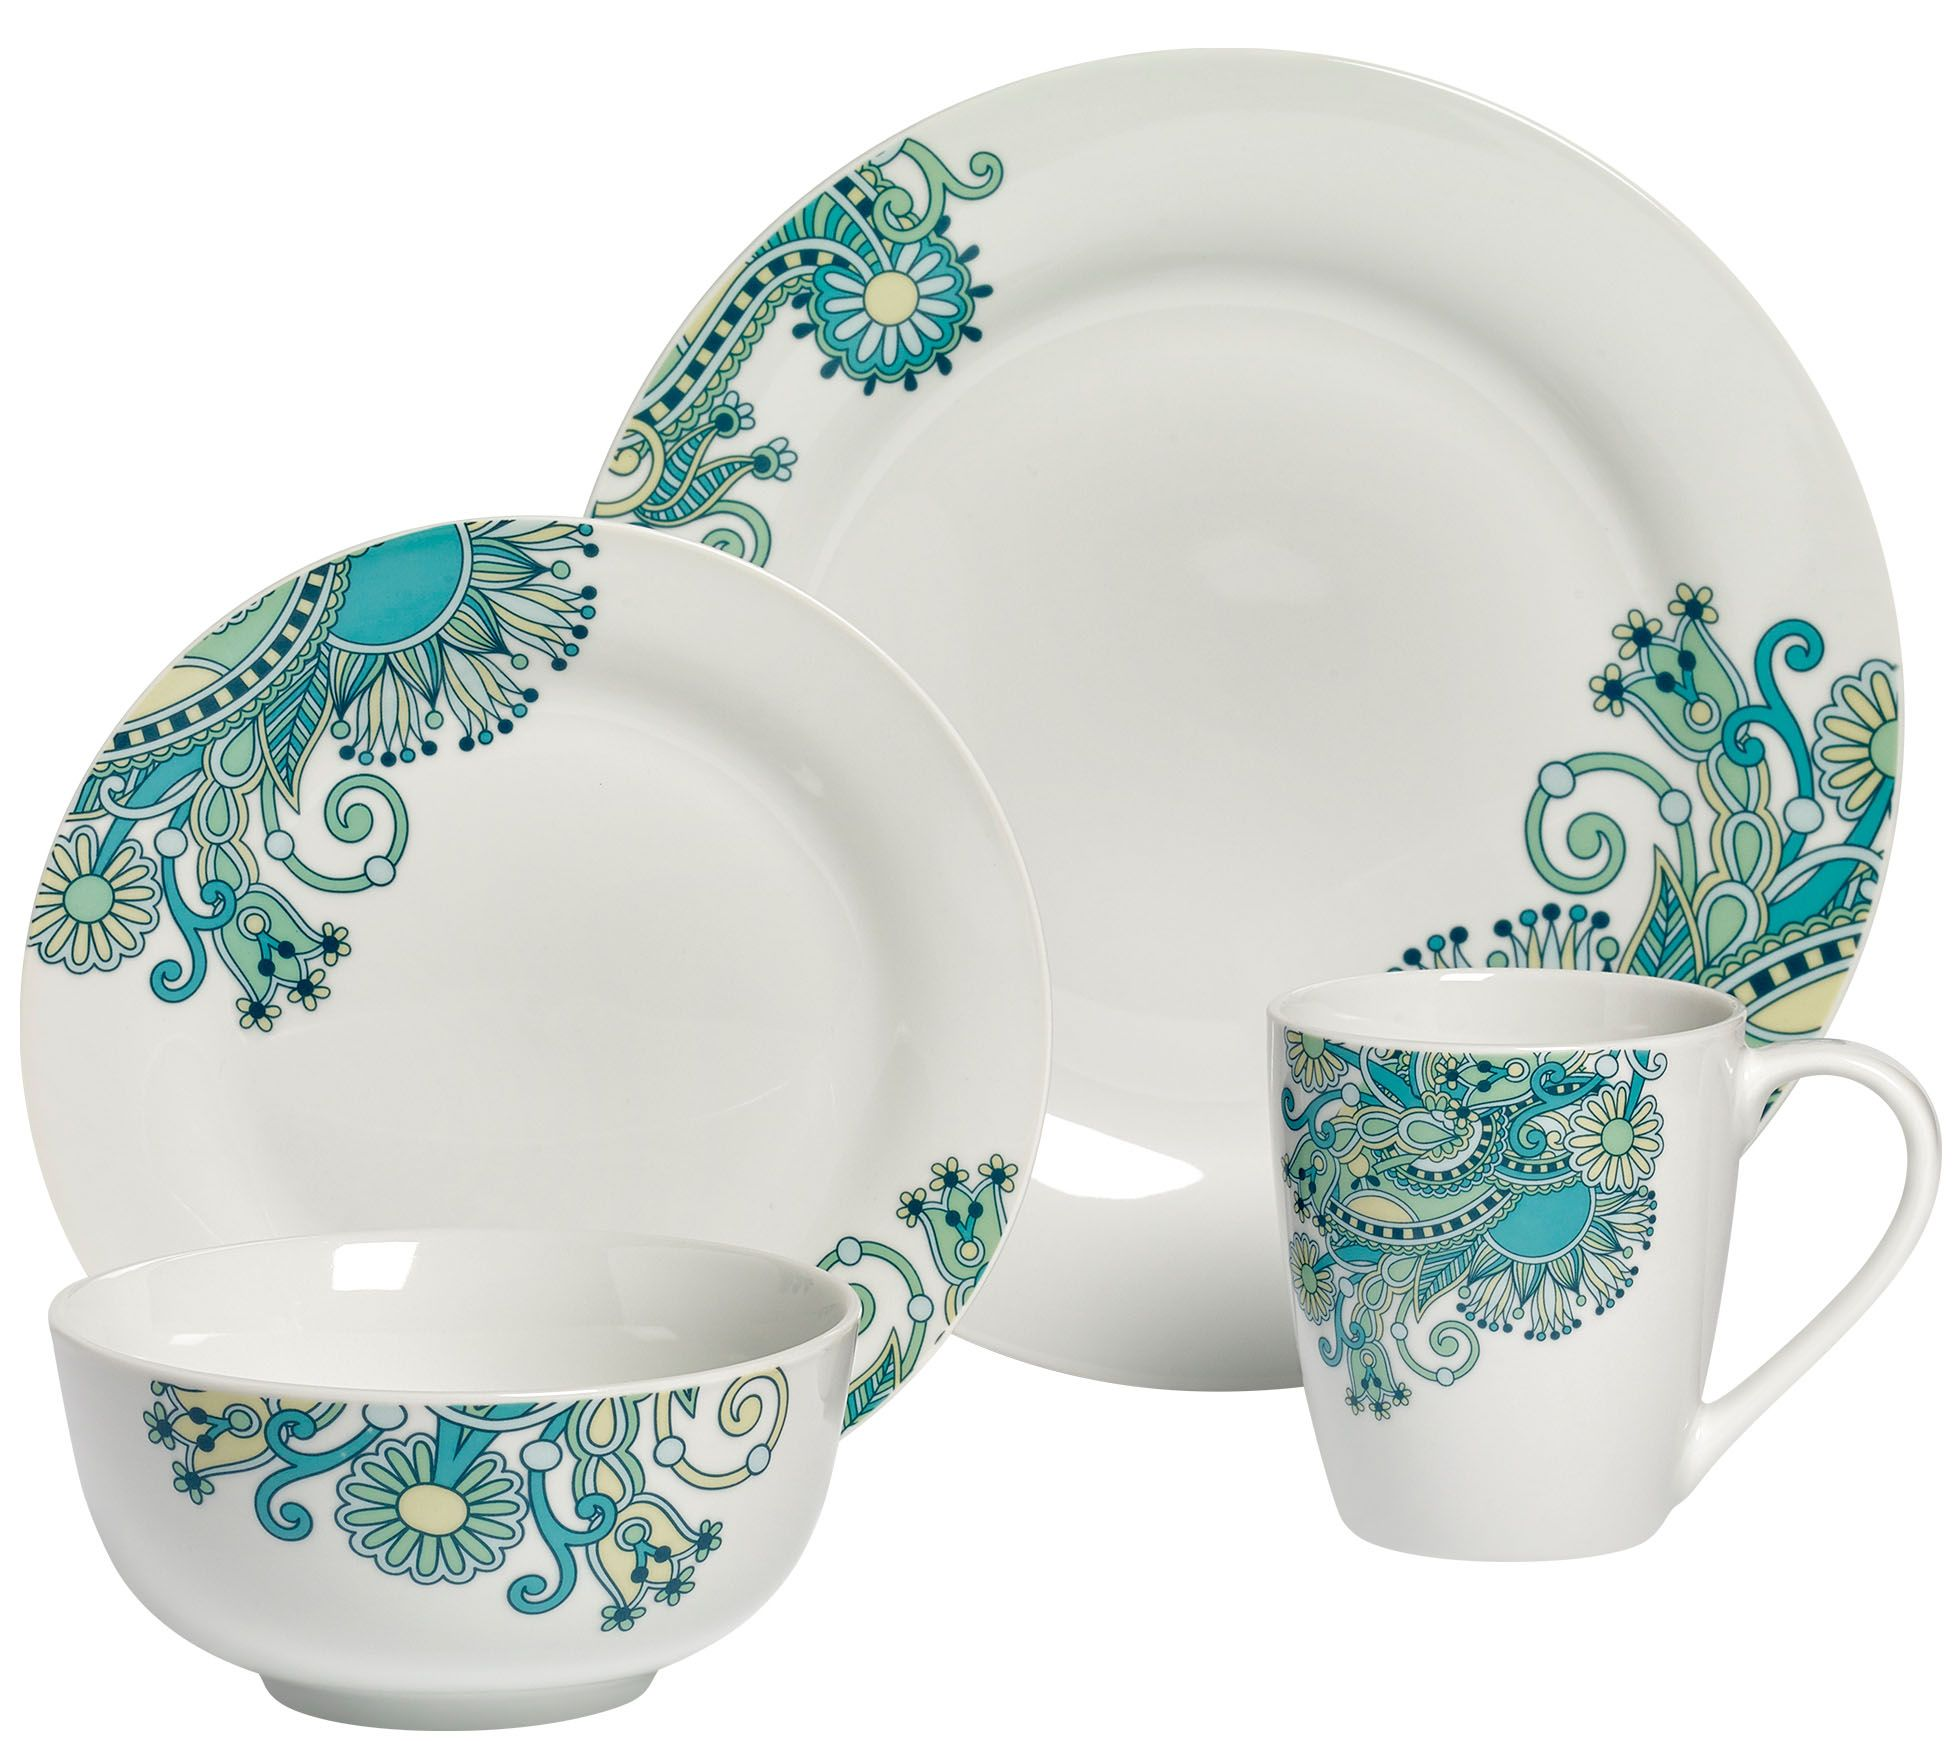 sc 1 st  QVC.com & Tabletops Gallery 16-Piece Dinnerware Set - Tansy u2014 QVC.com